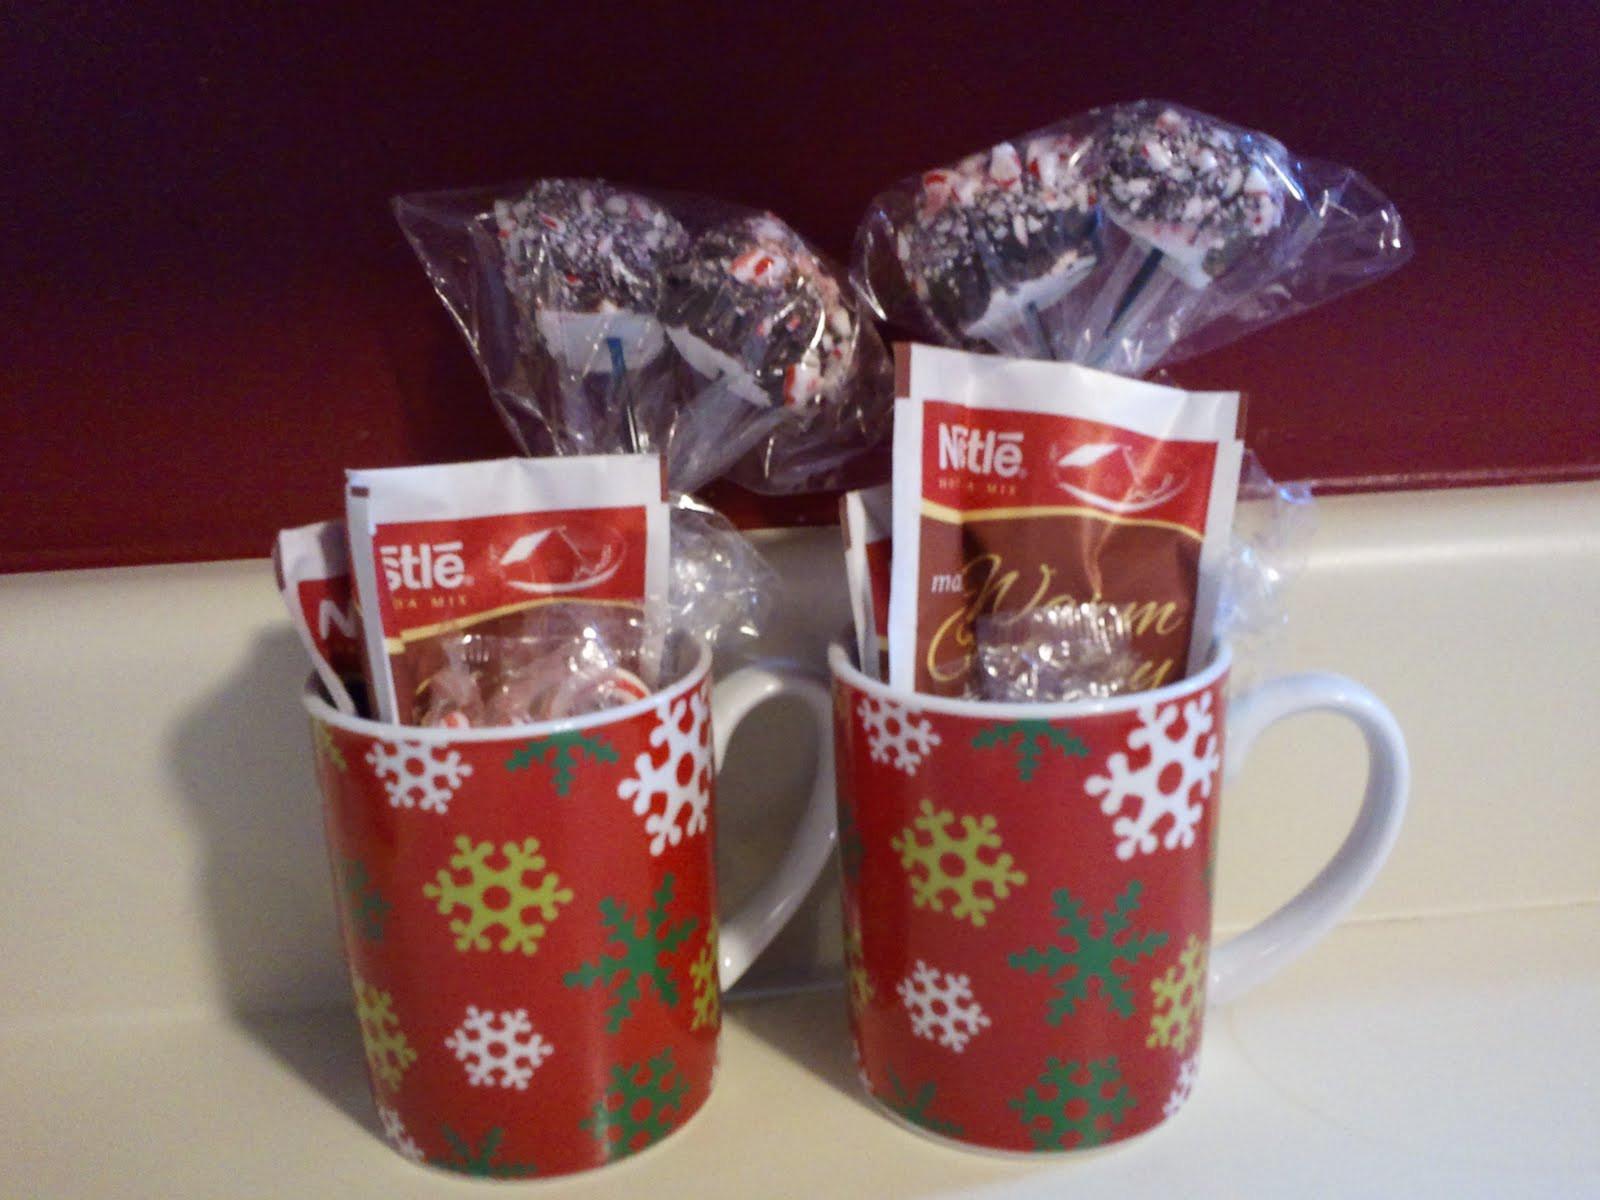 Christmas Mug Gift Ideas  Peppermint Hot Chocolate Stirrers Homemade Christmas